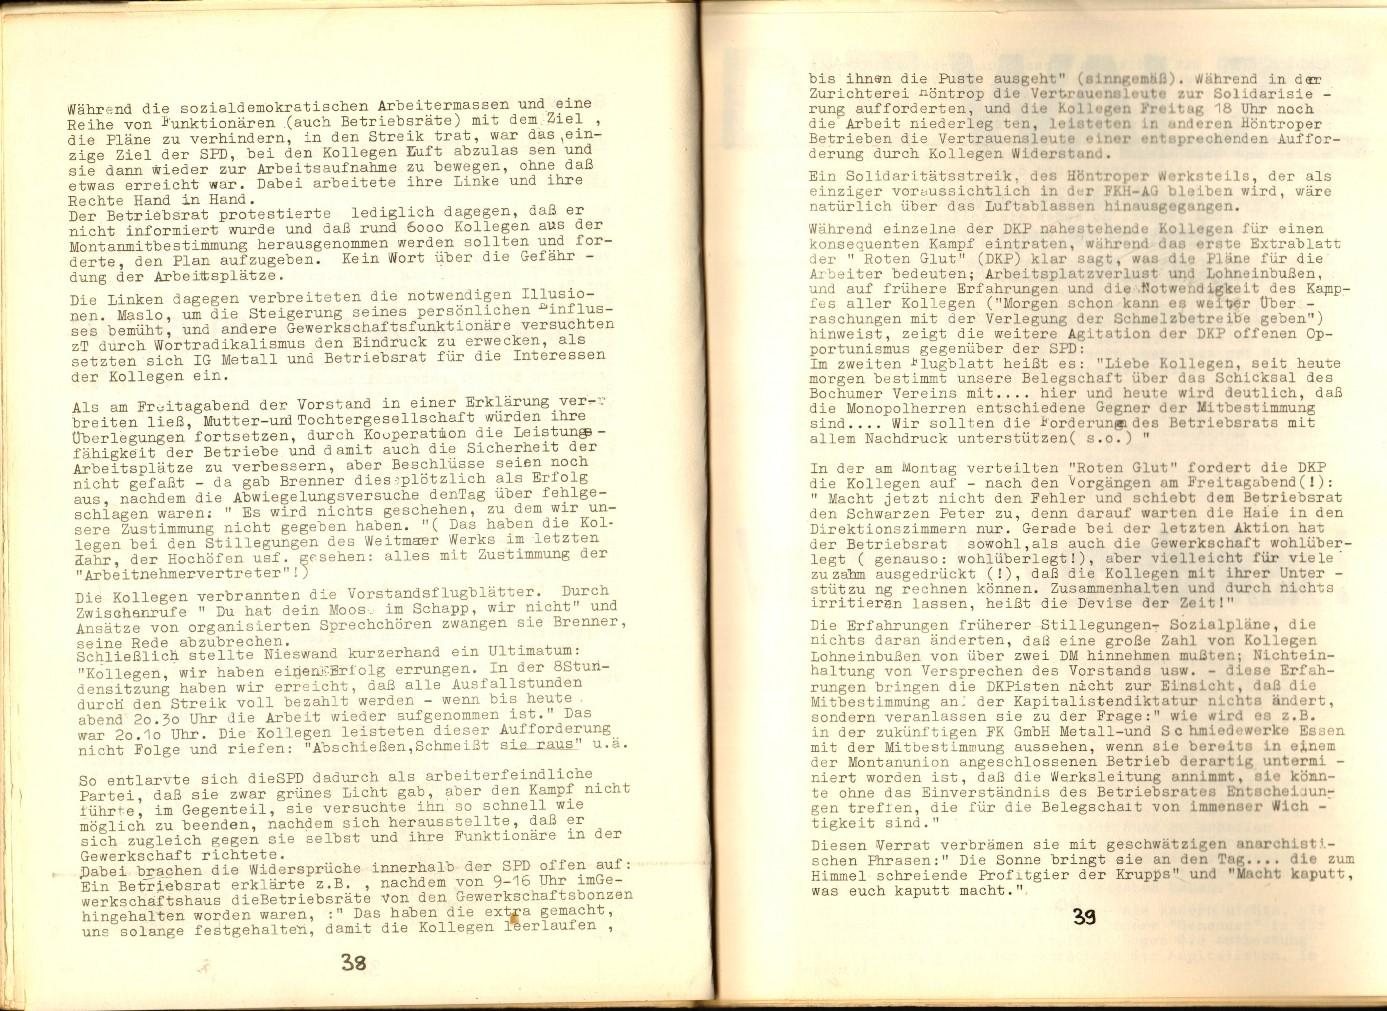 ZB_Parteiarbeiter_1970_03_24